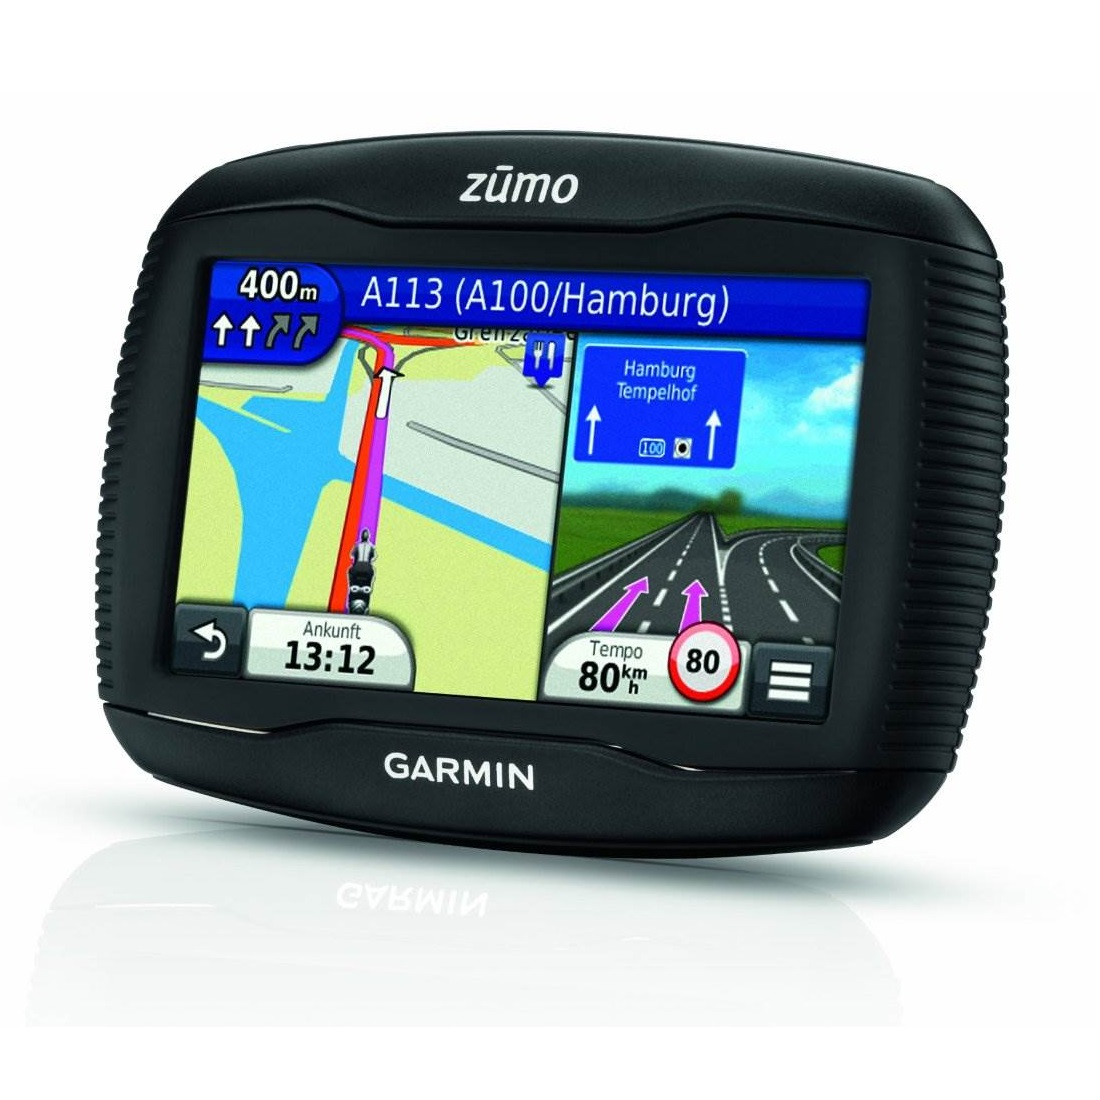 Moto navigace GARMIN zümo 390 Europe Lifetime Moto navigace, 4,3 LCD displej, 45 zemí Evropy 010-01186-01